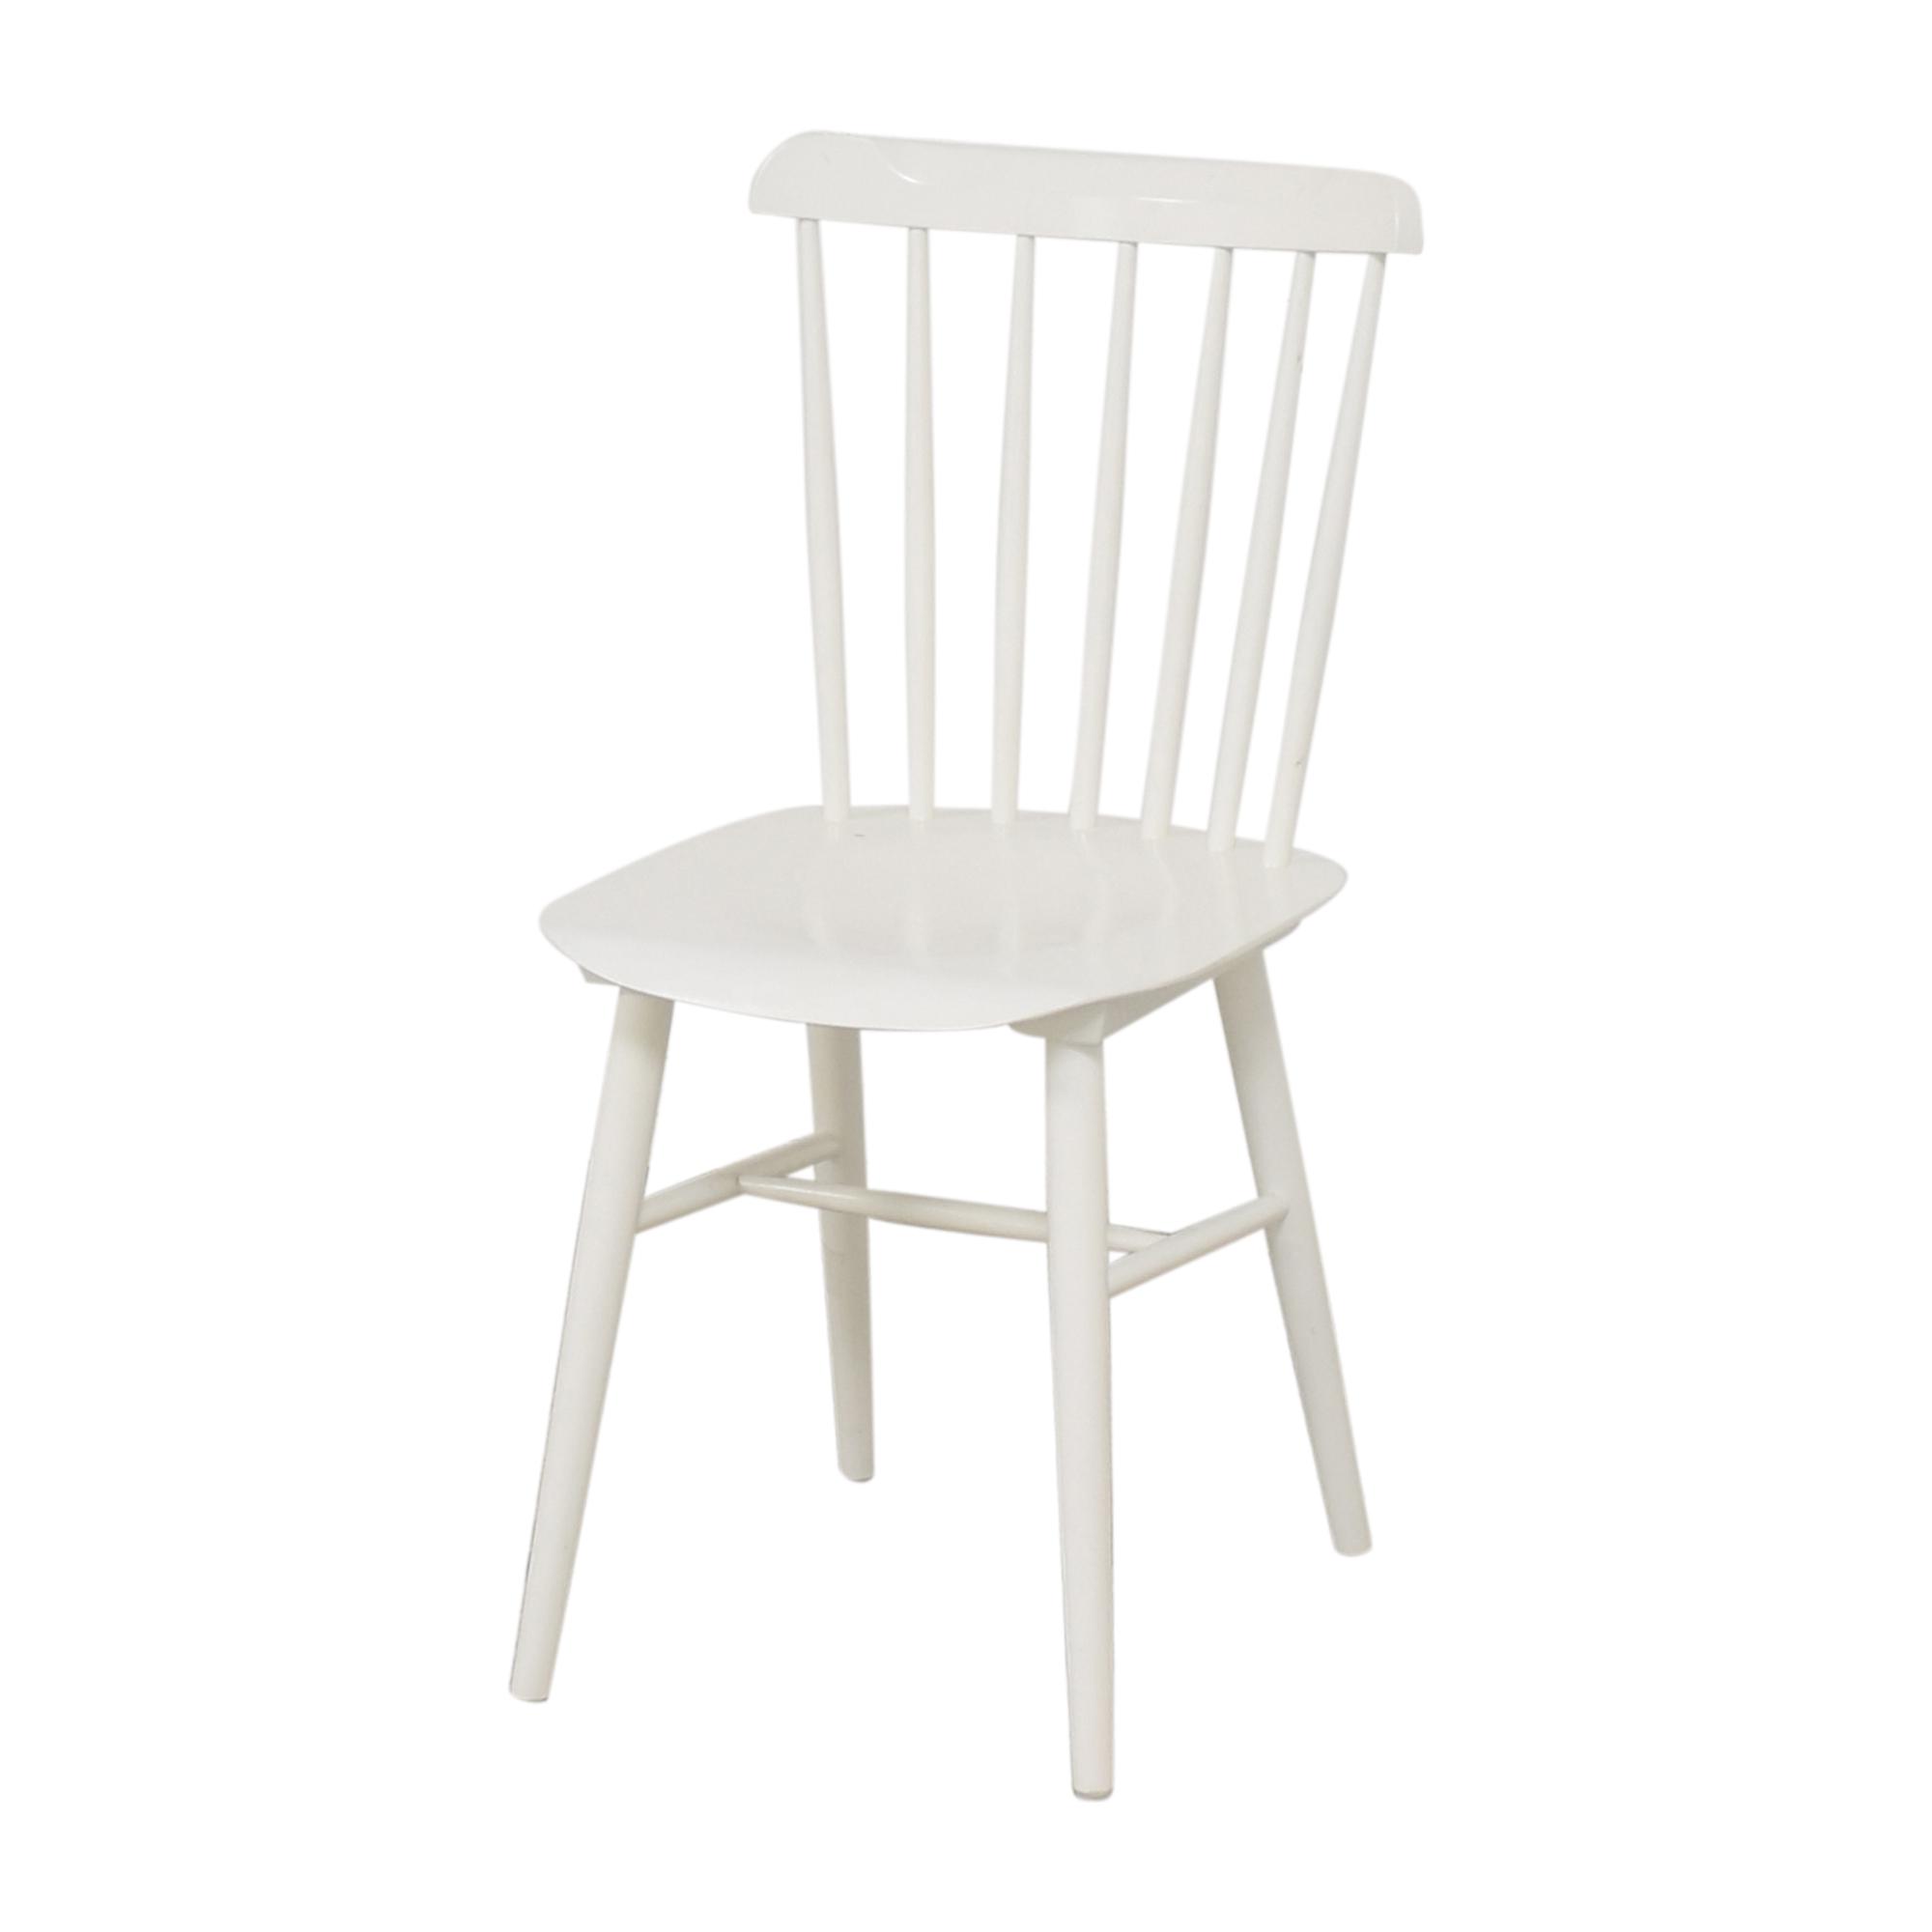 Design Within Reach Design Within Reach Salt Side Chairs white